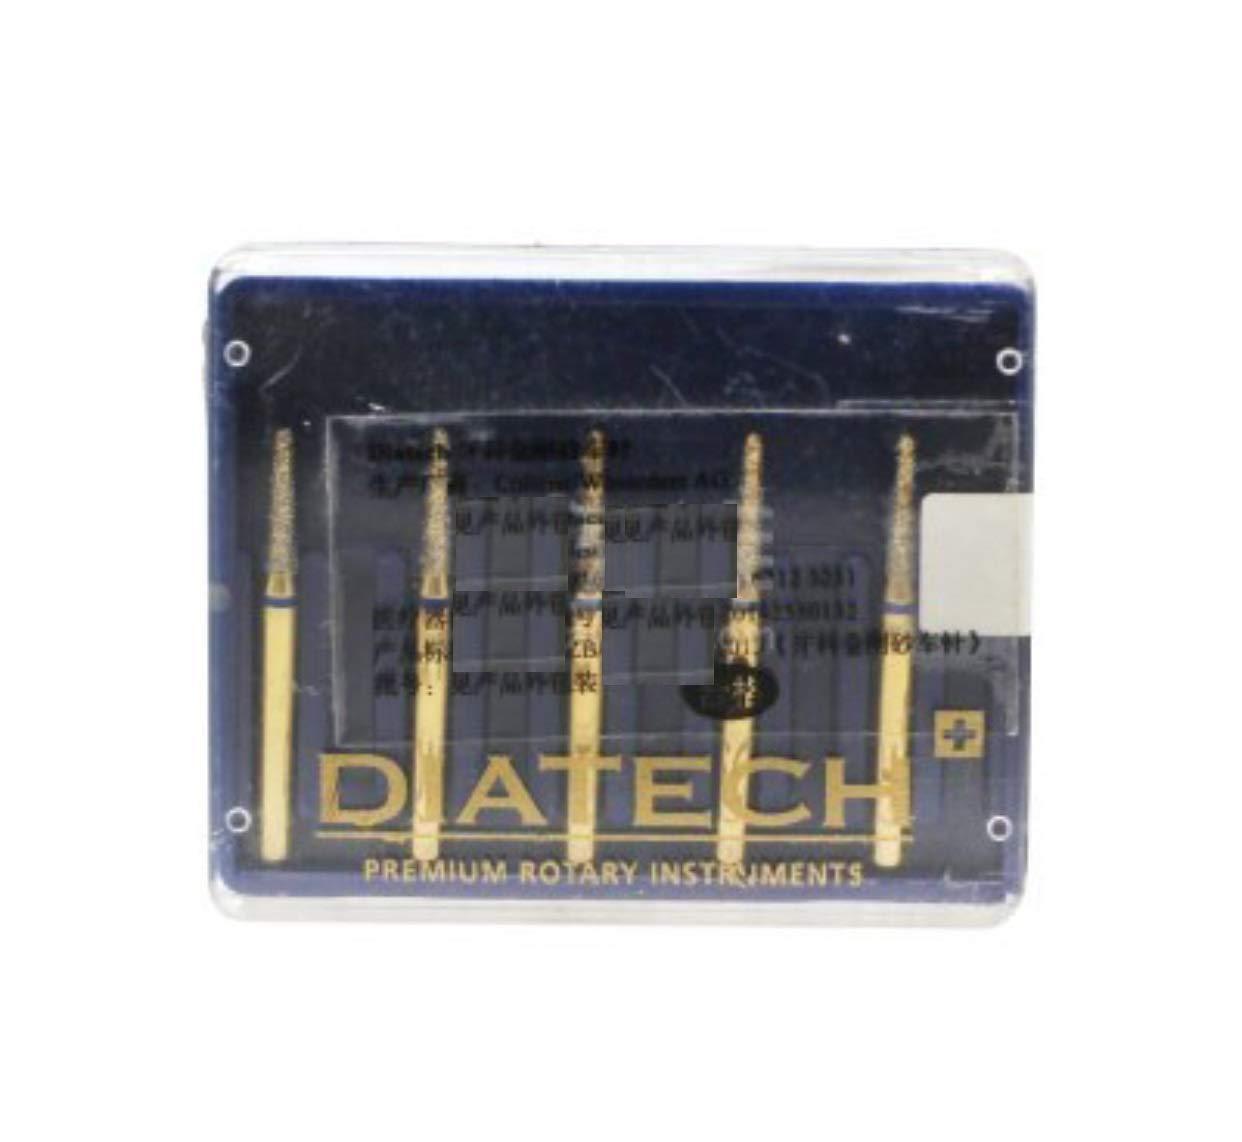 Dental COLTENE Diatech carborundum needle kit 846-014-6ML